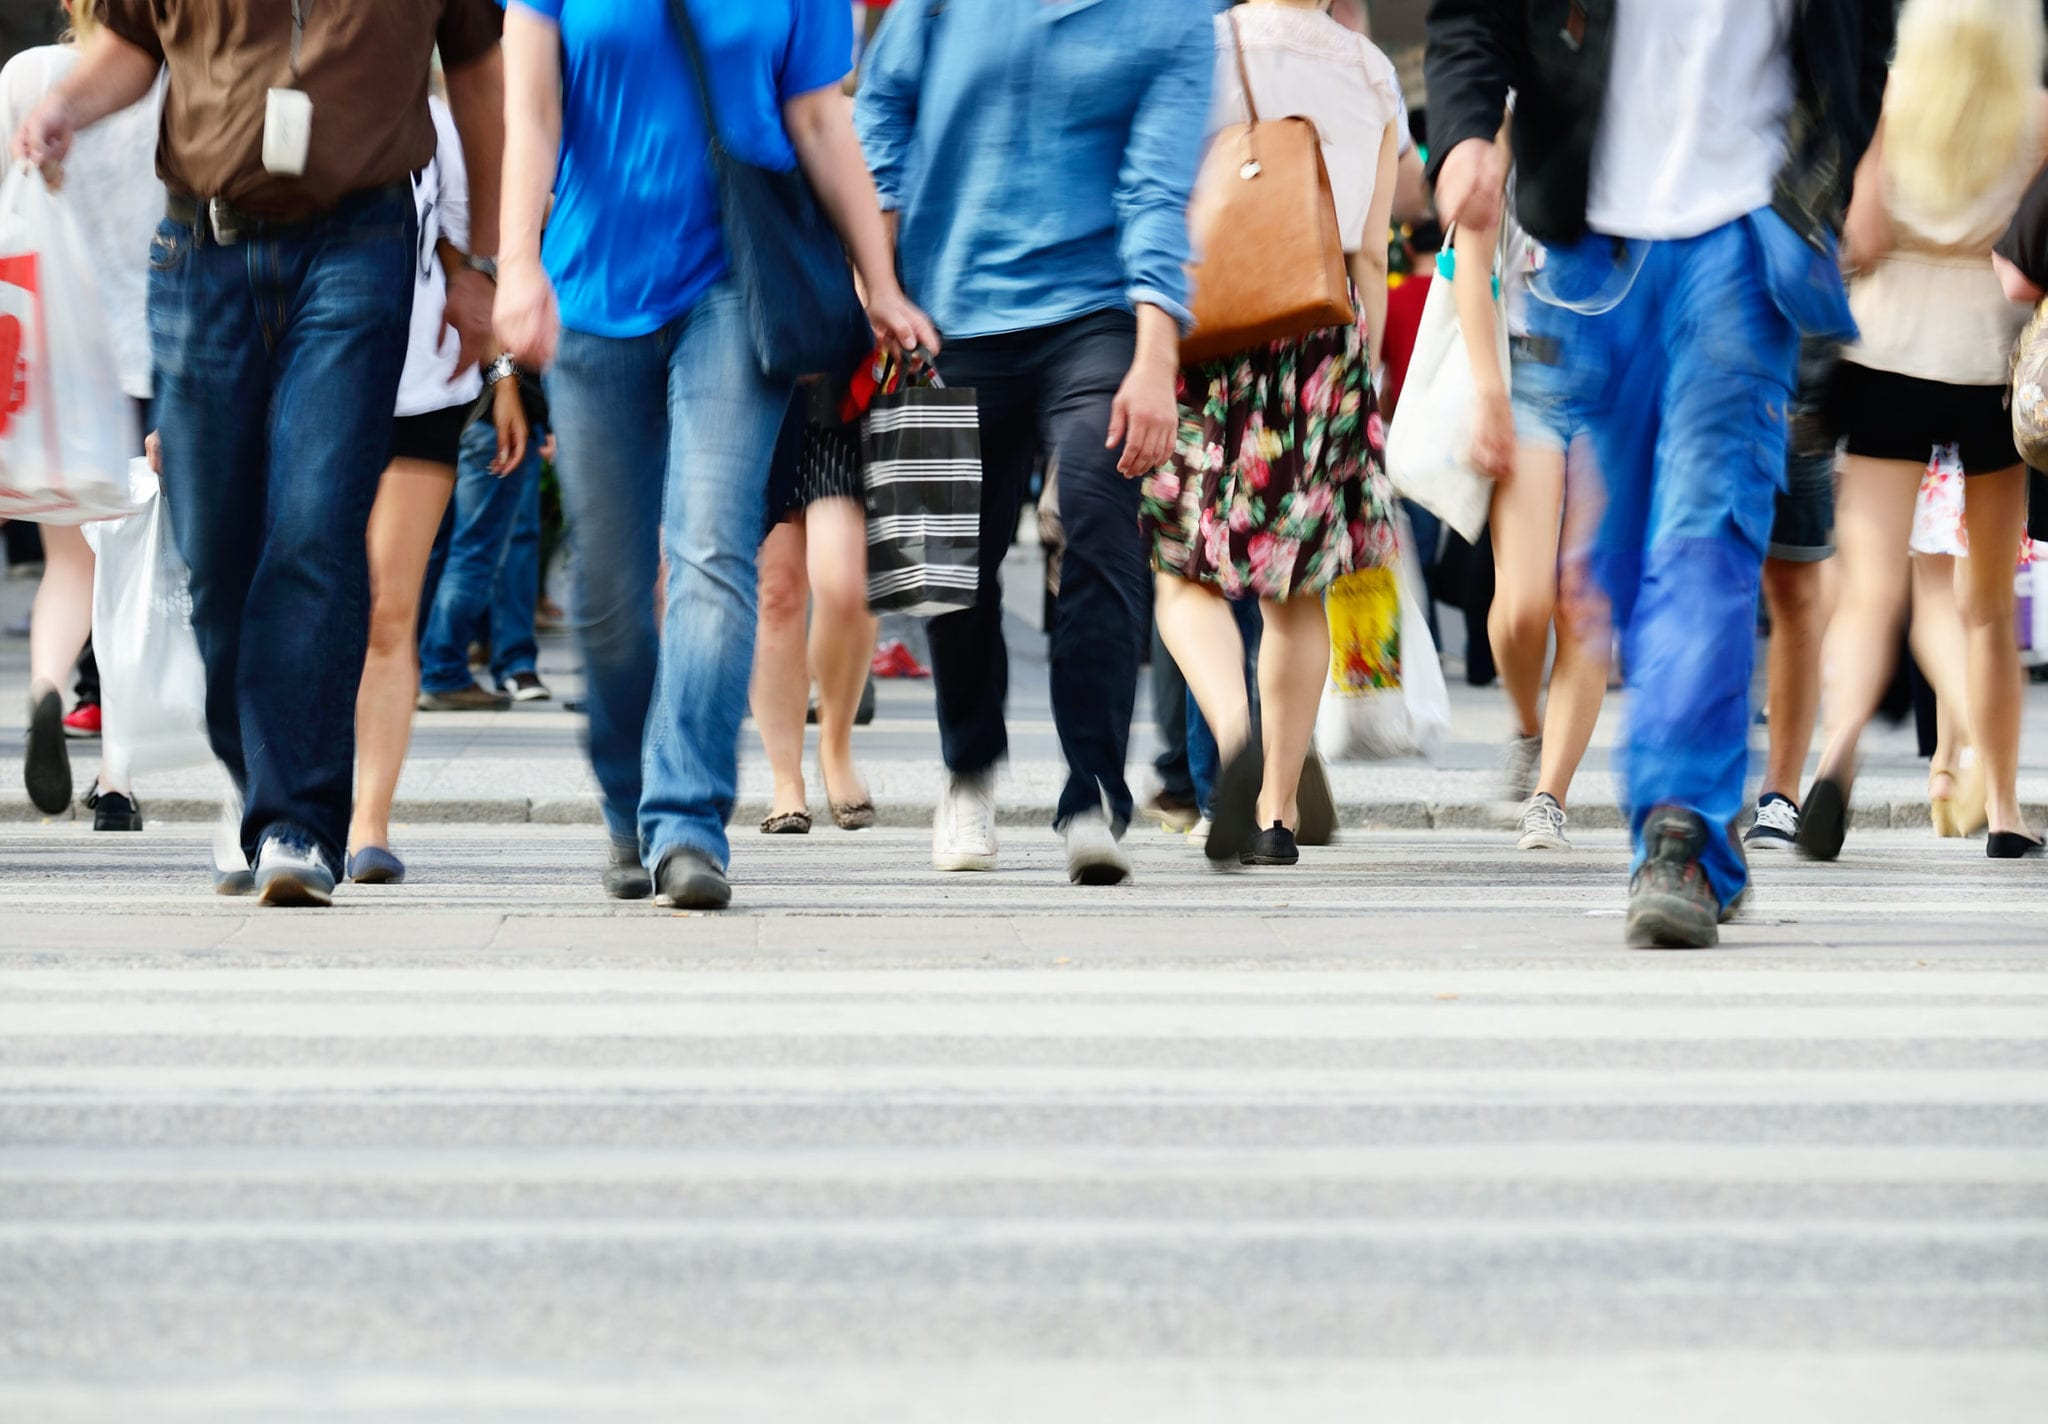 Texas Premise Pedestrian Accidents